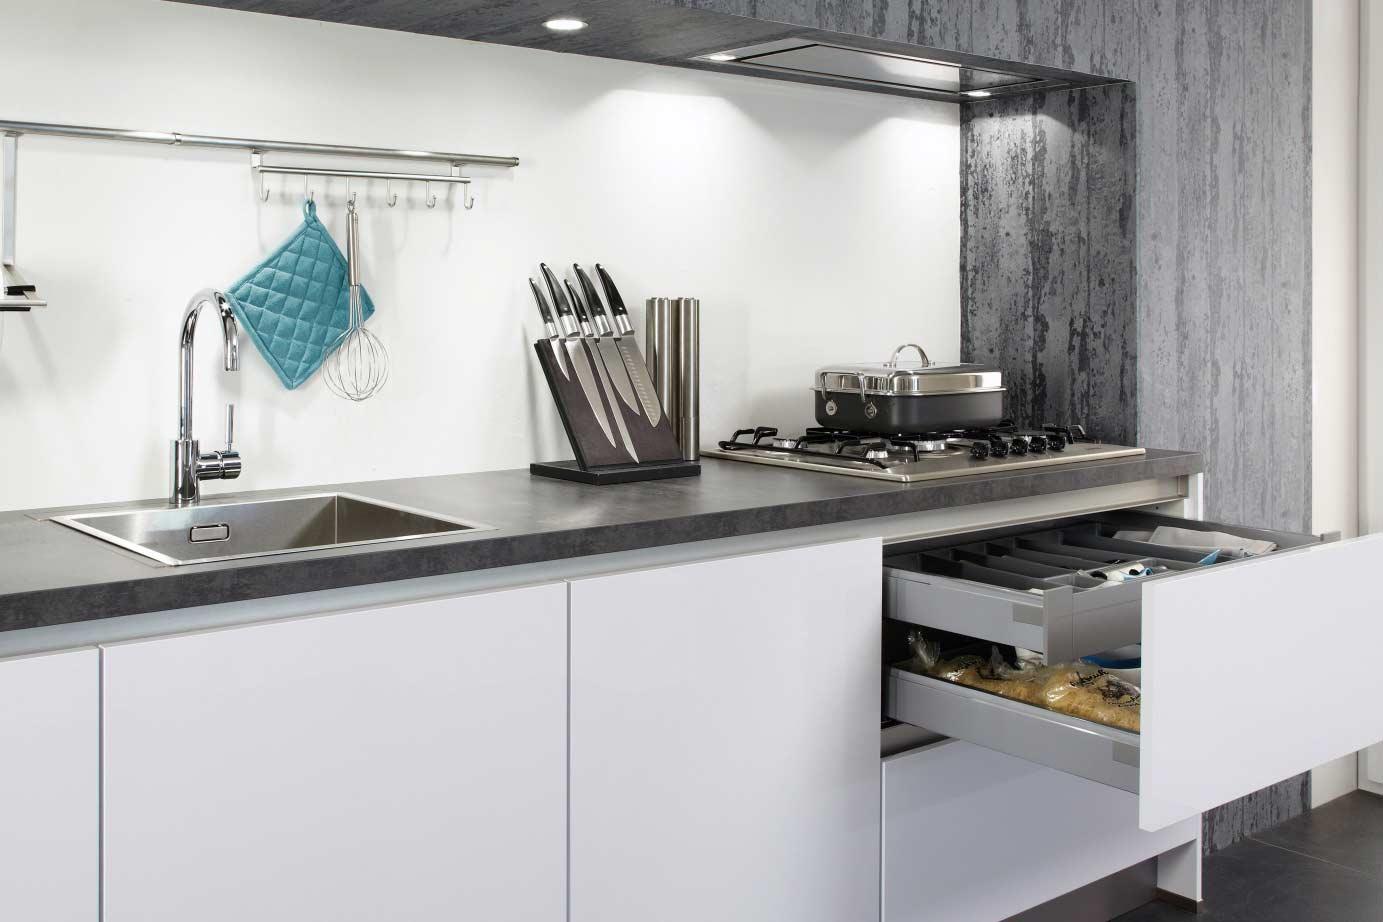 Goedkope Landelijke Keukens : Goedkope landelijke keukens good goedkope landelijke keukens les